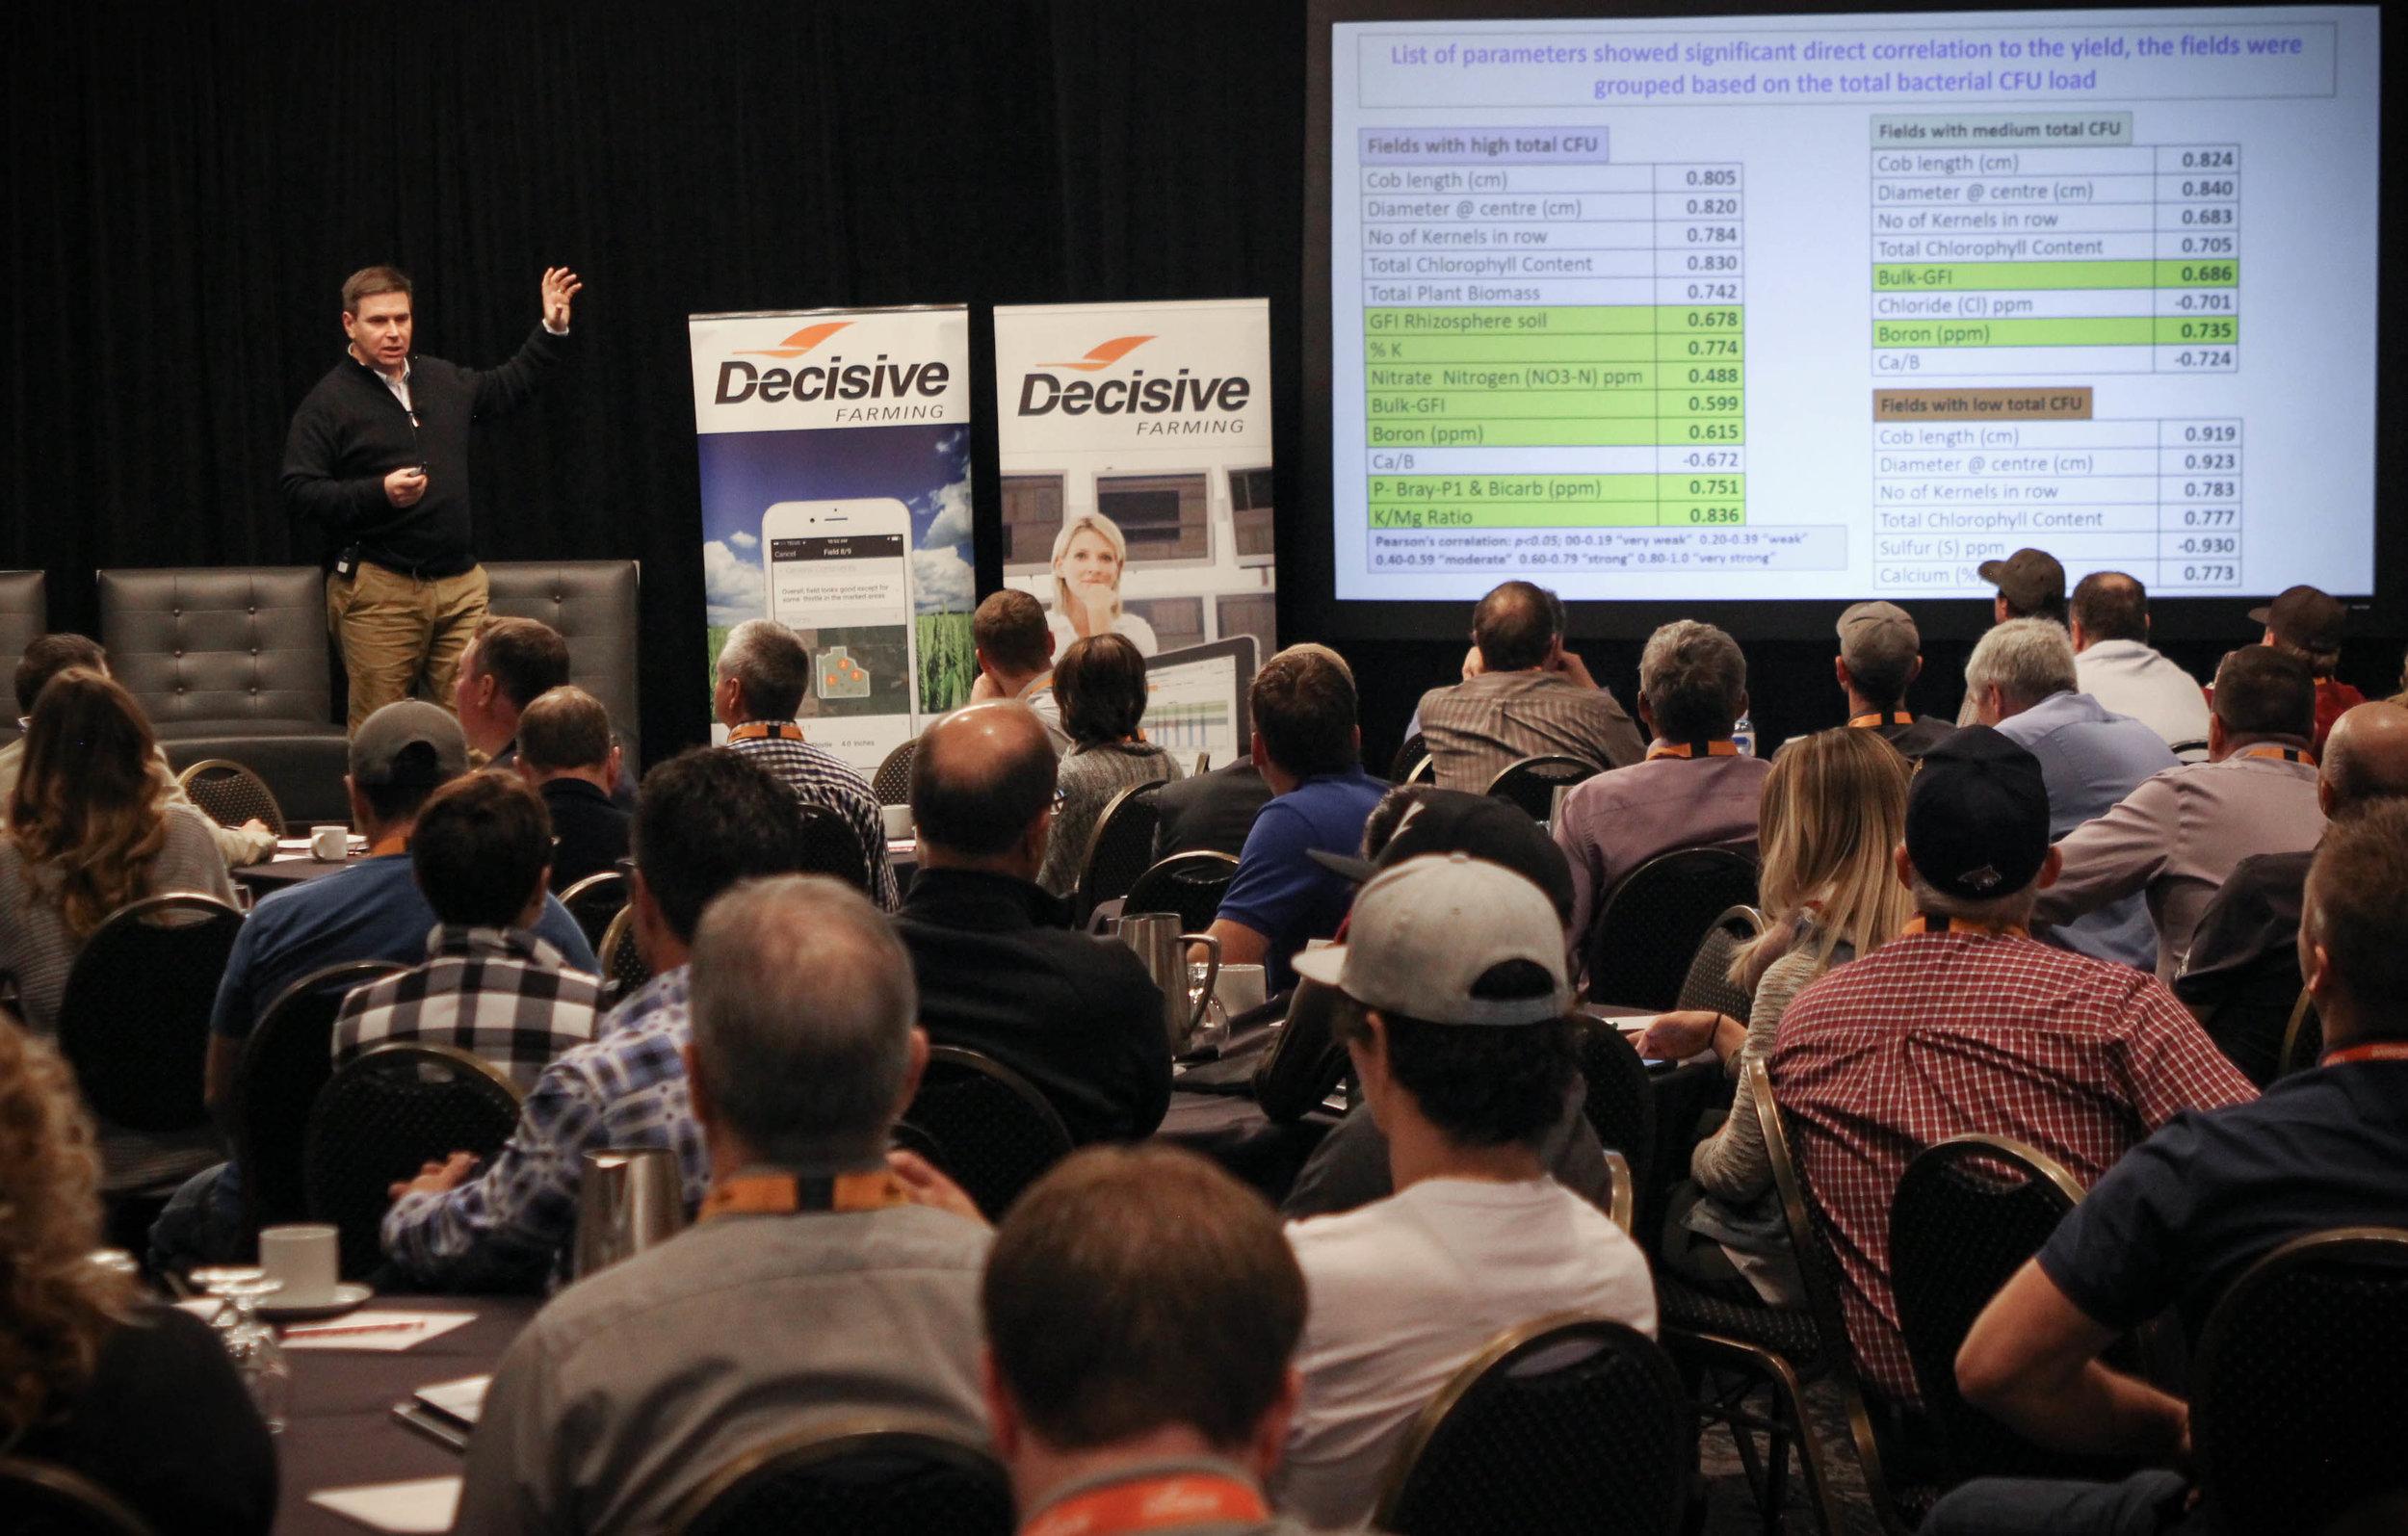 Dan Clarke, Executive VP Business Development & Agronomy at A&L Canada Laboratories